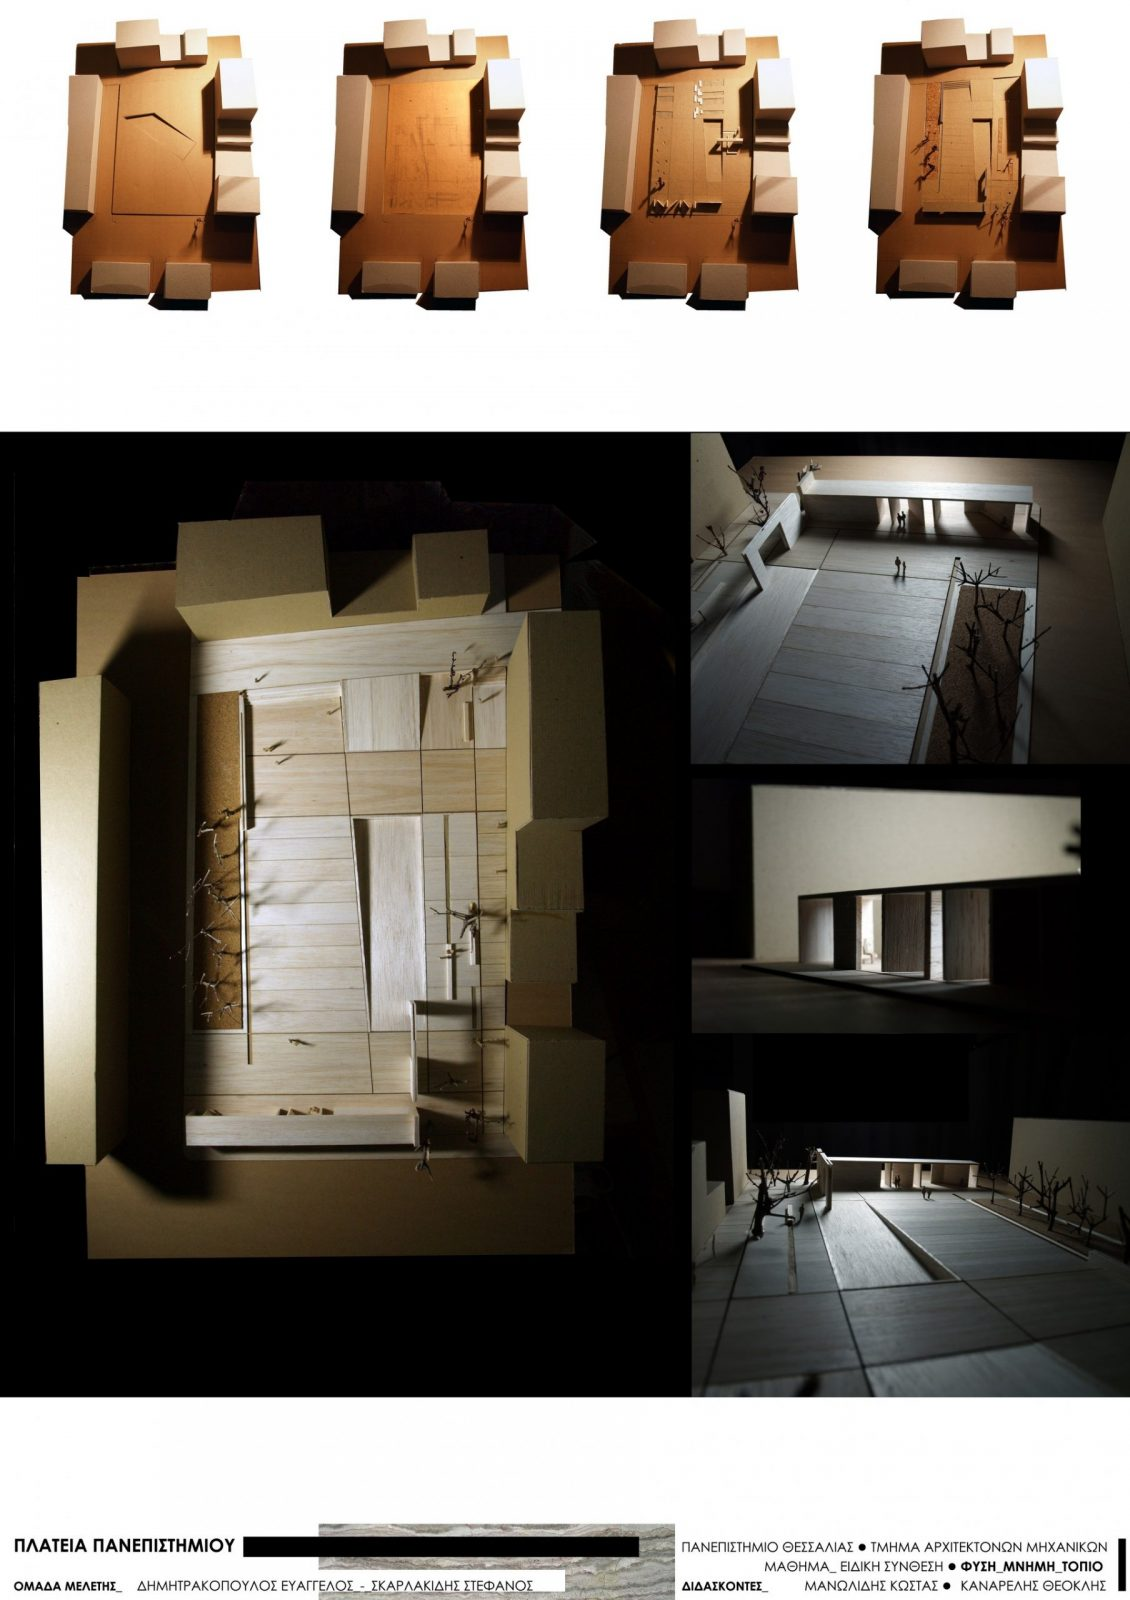 Panepistimiou Square - 2